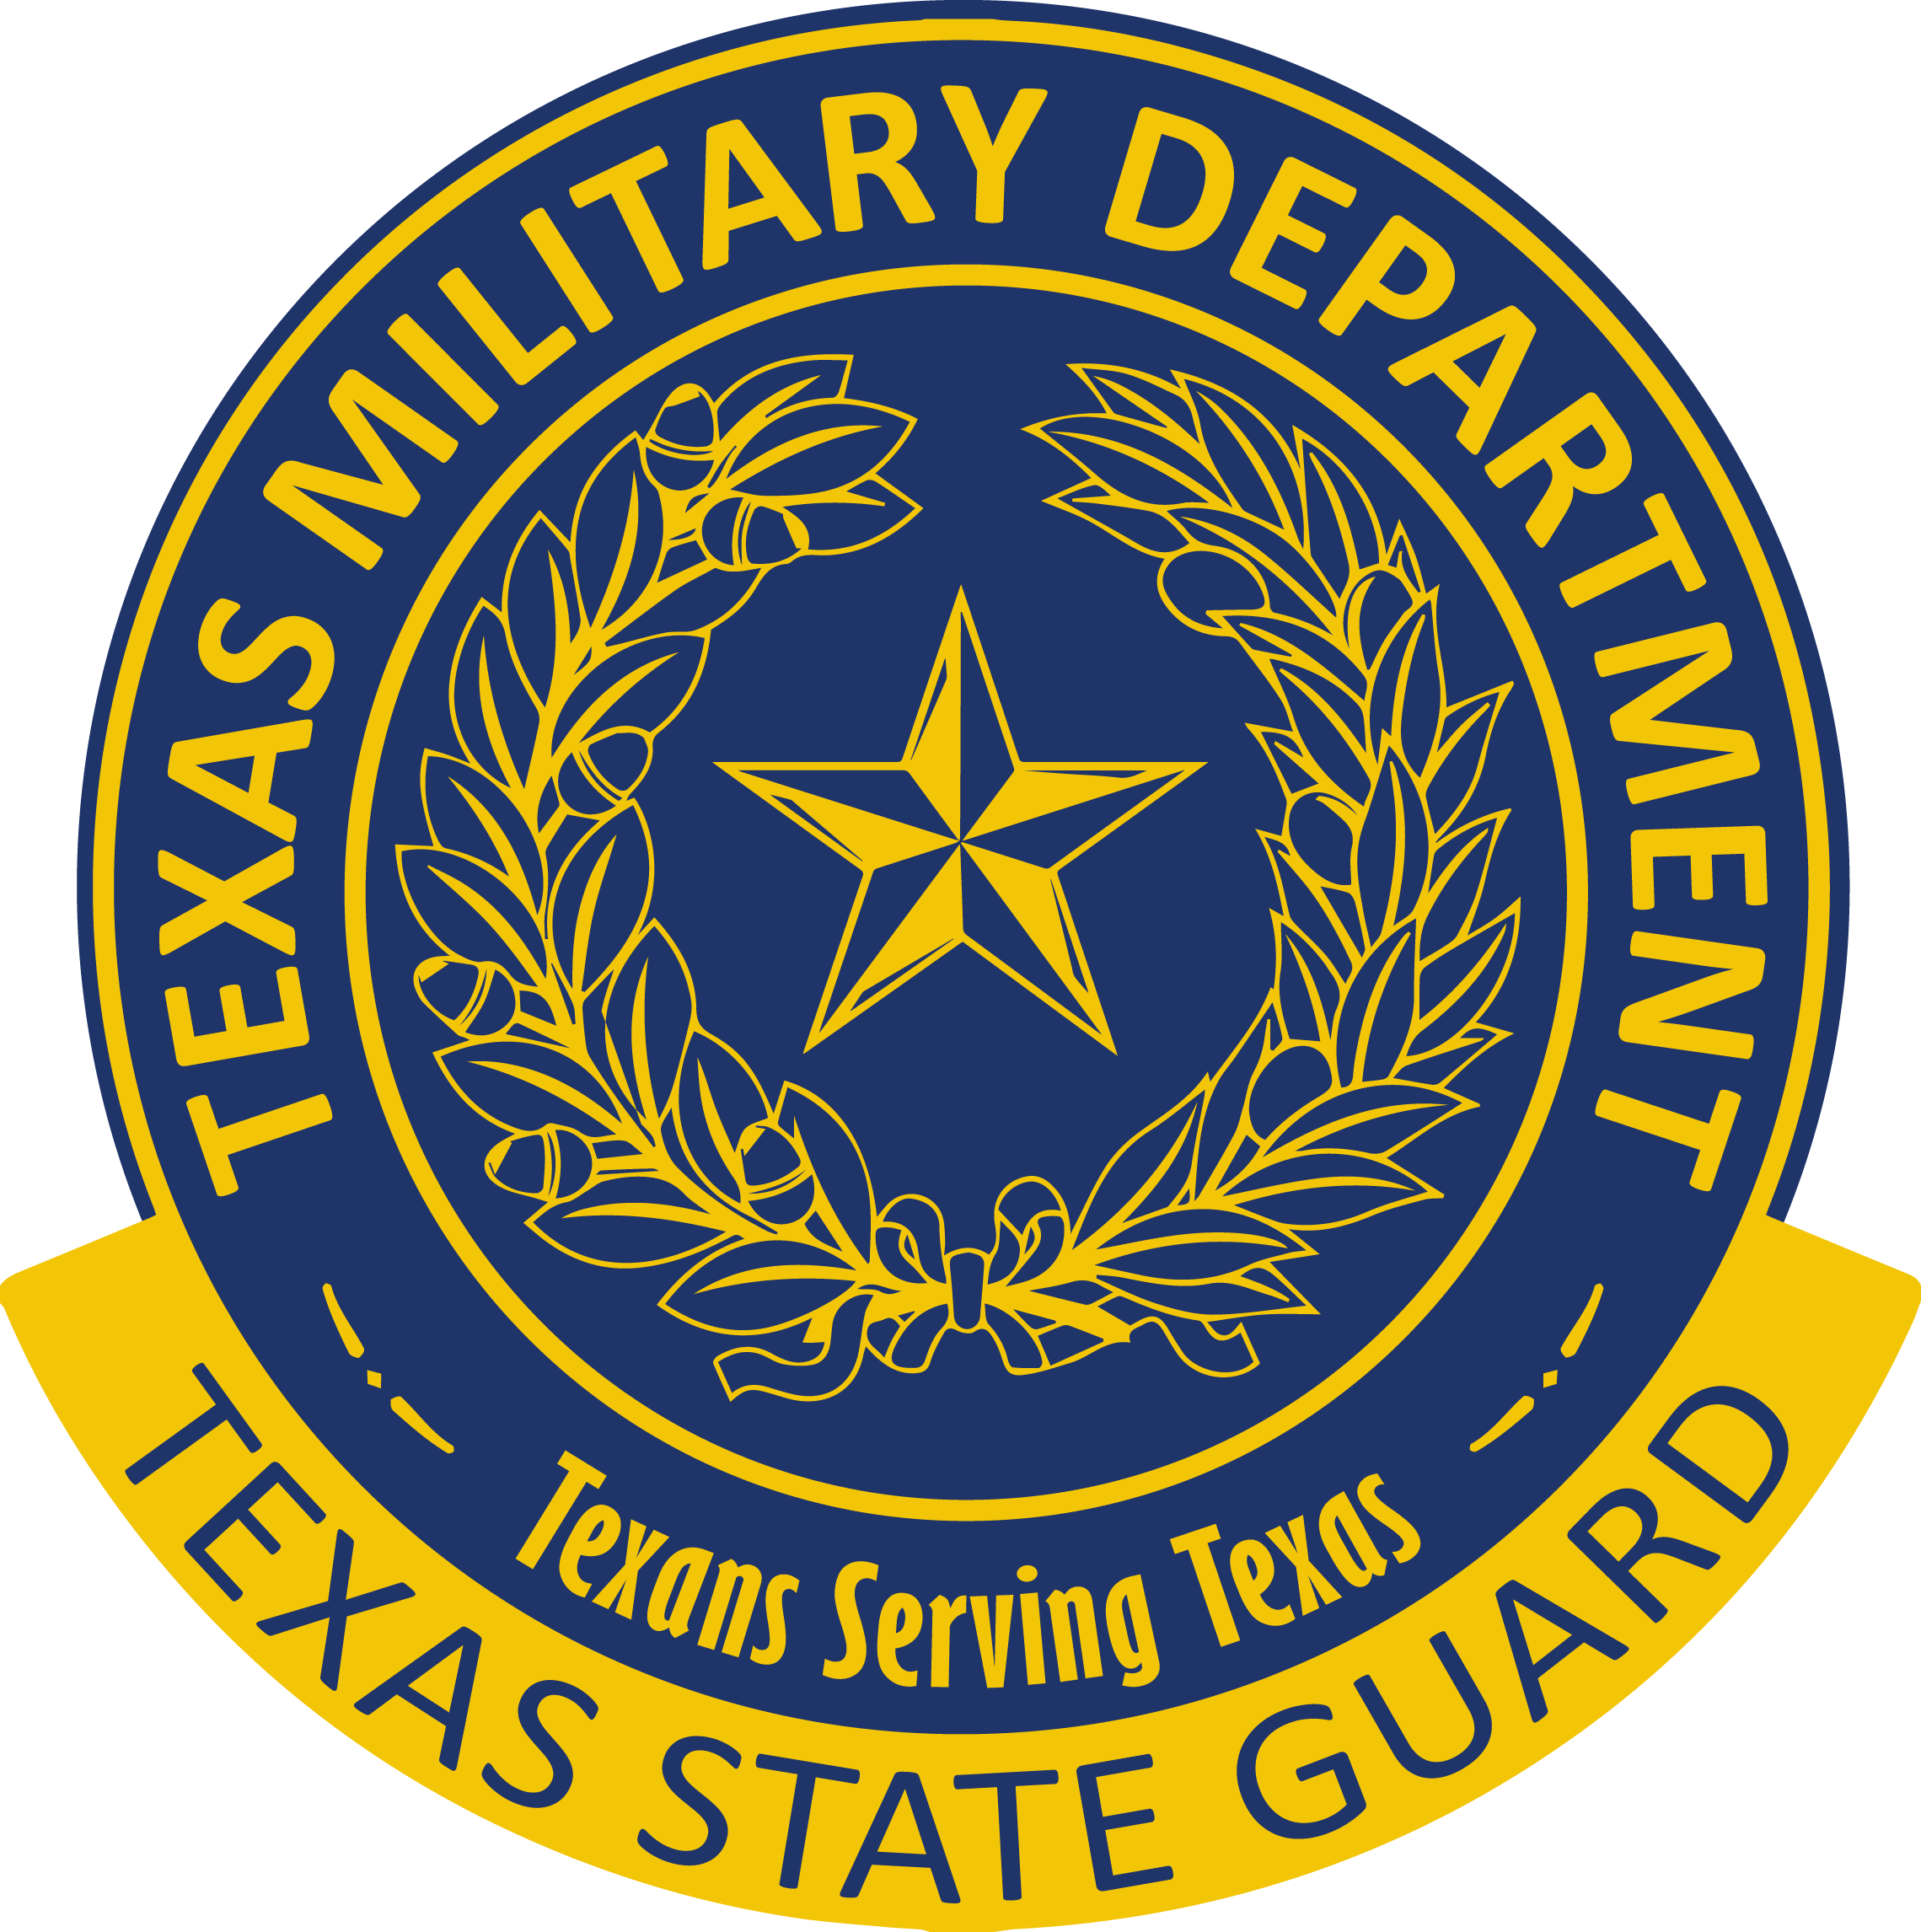 TMD Branding - Texas Military Department